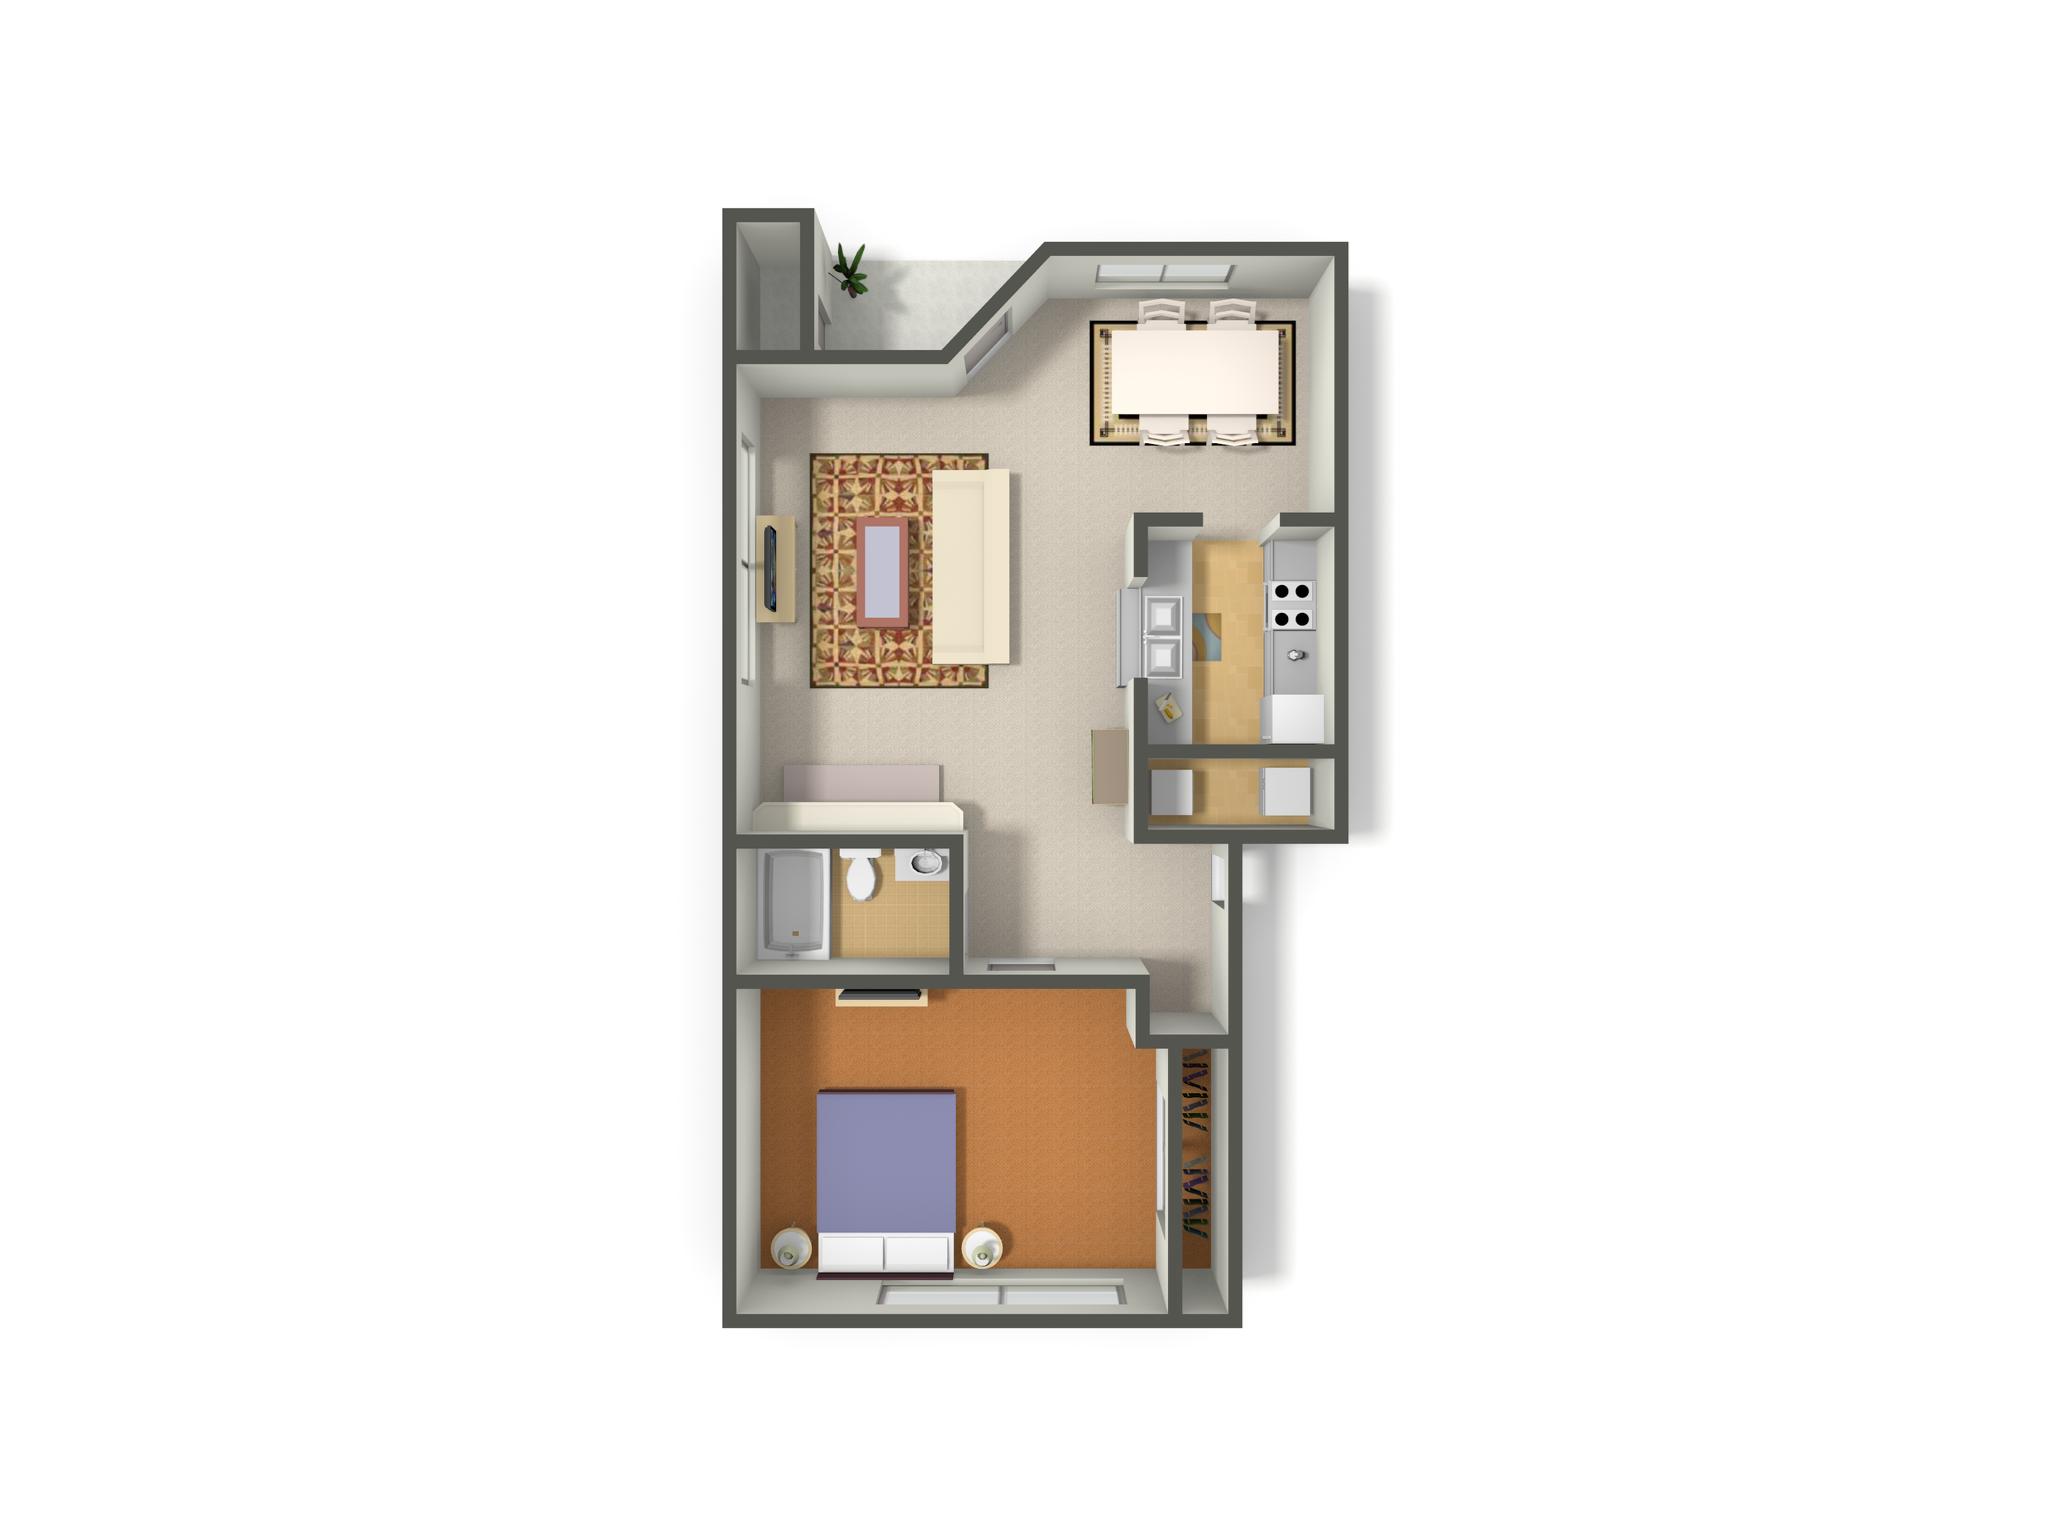 1 Bed-1 Bath Mini-Upgrade Floor Plan 2